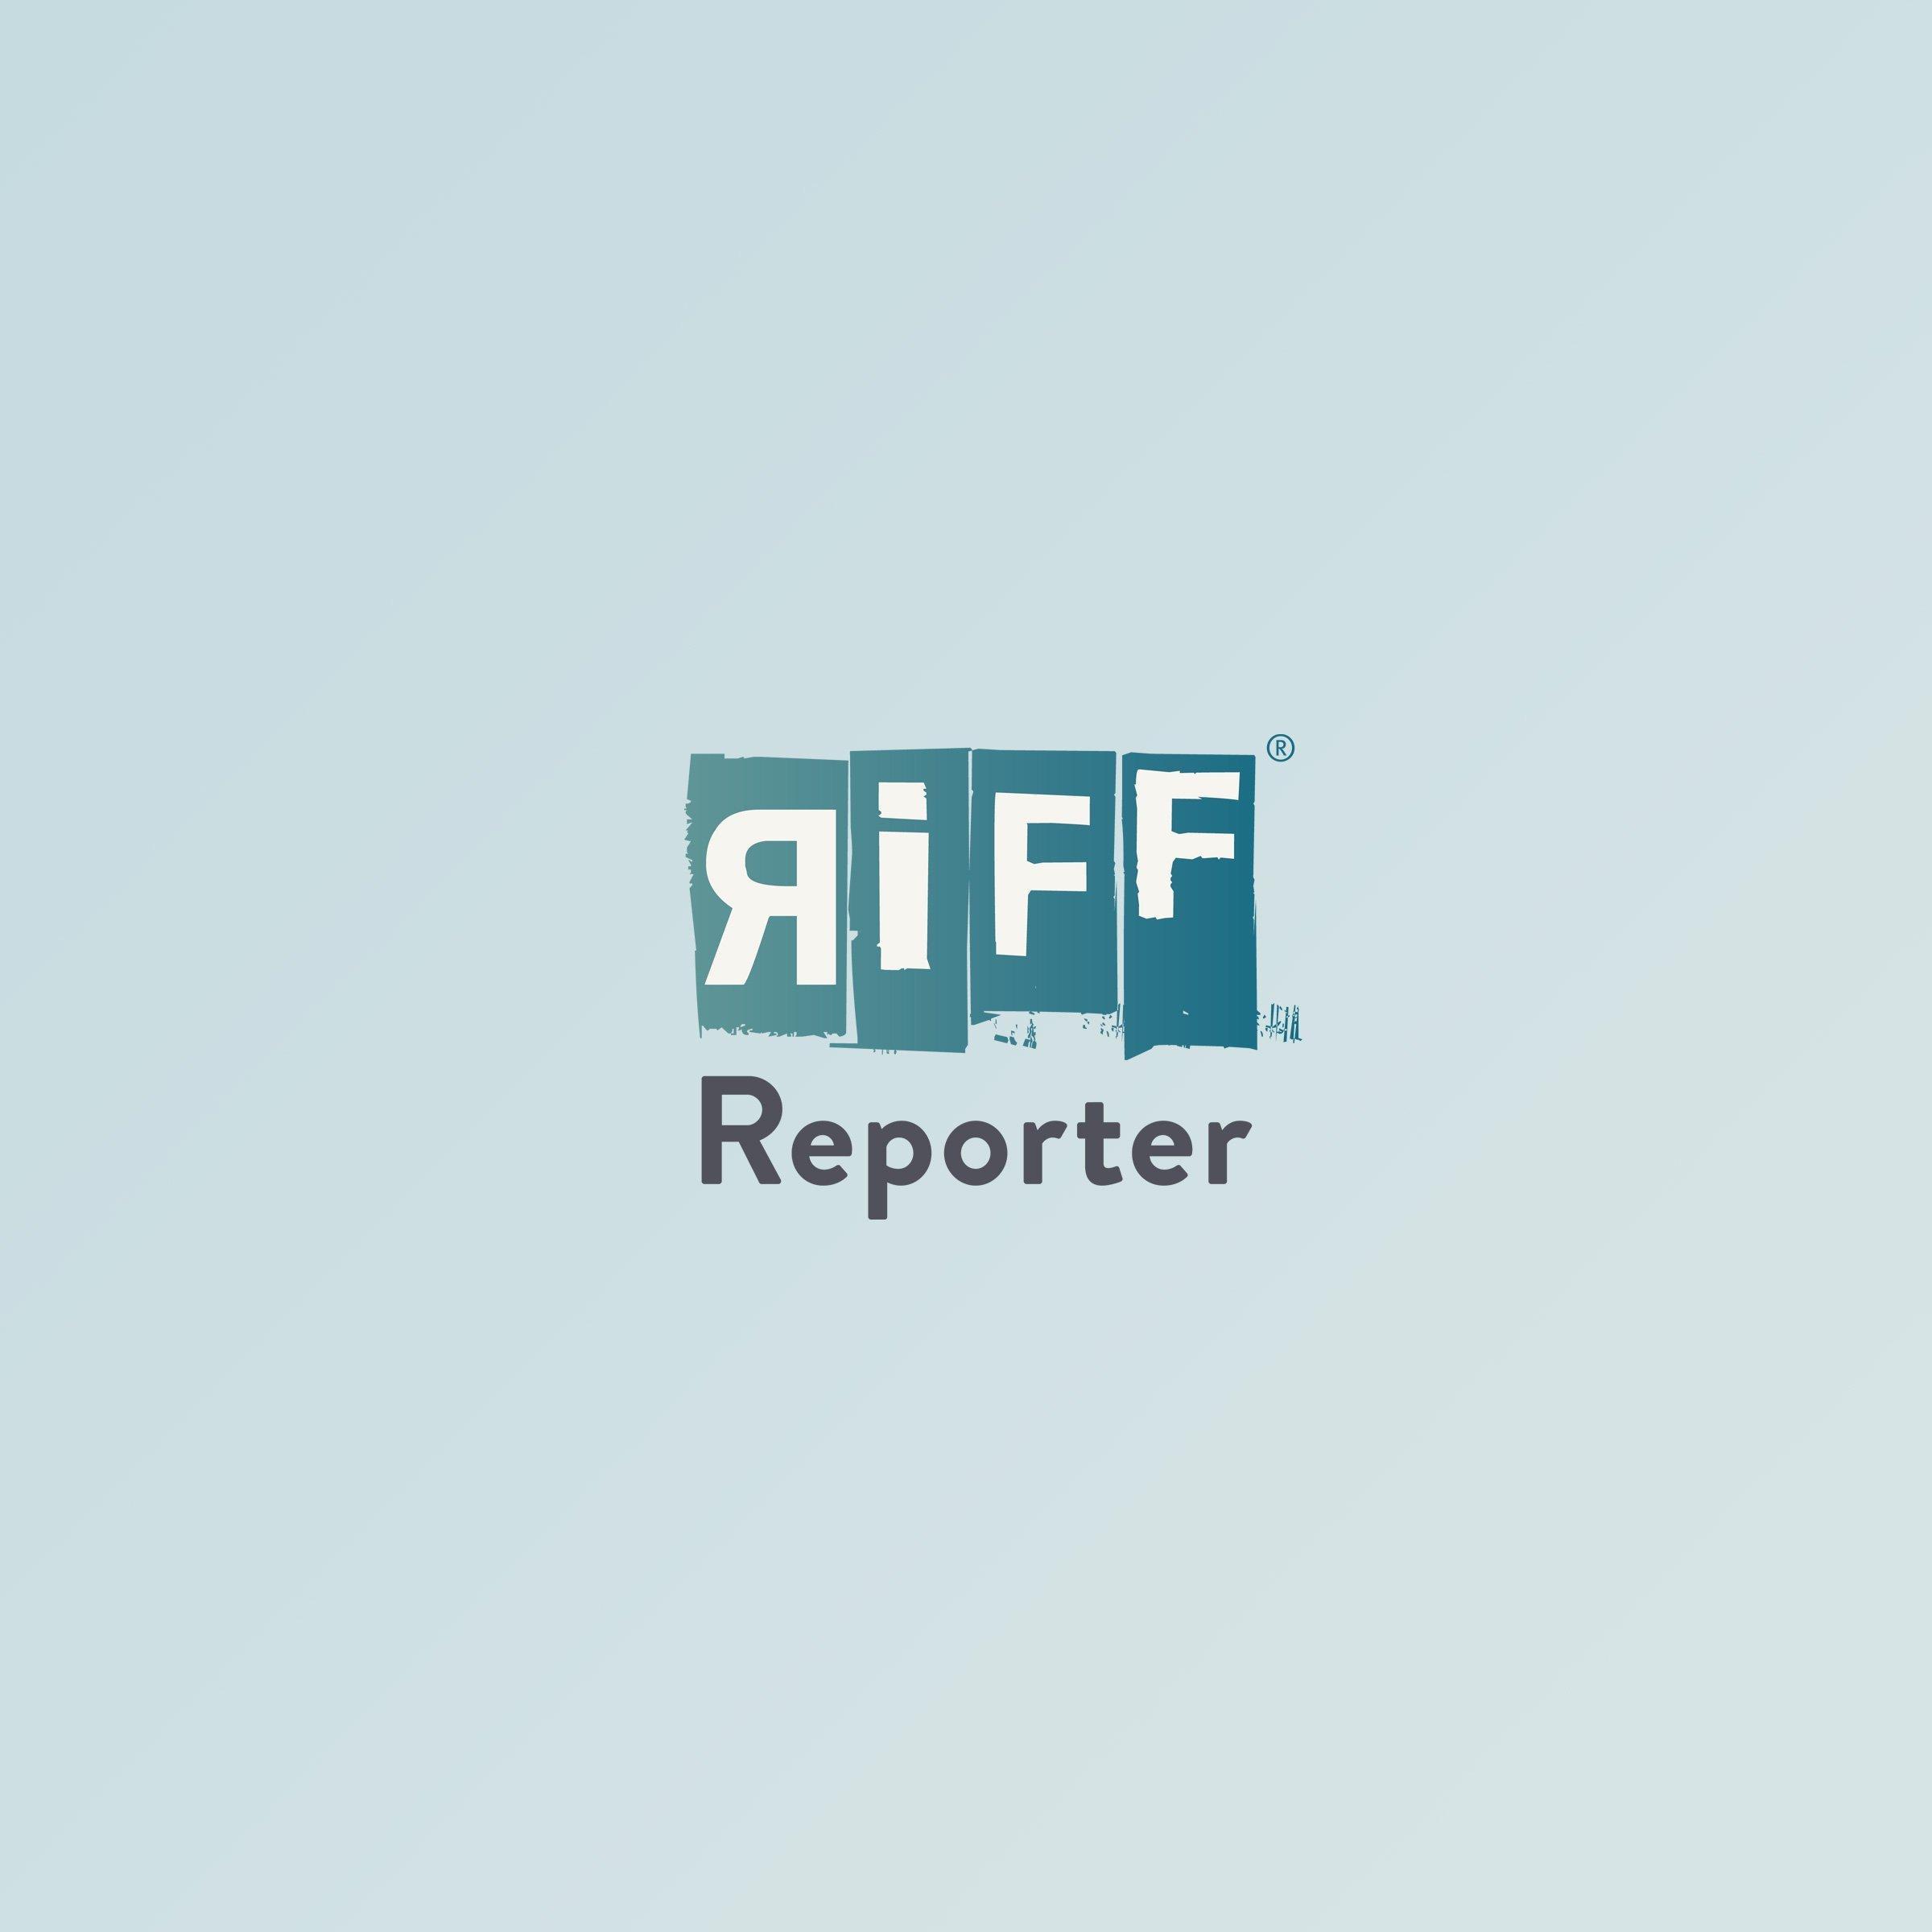 Installation ORIGIN Computer animation und Drawing Series Planetesimale P_1, Drawing Rooms Hamburger Kunsthalle 2016